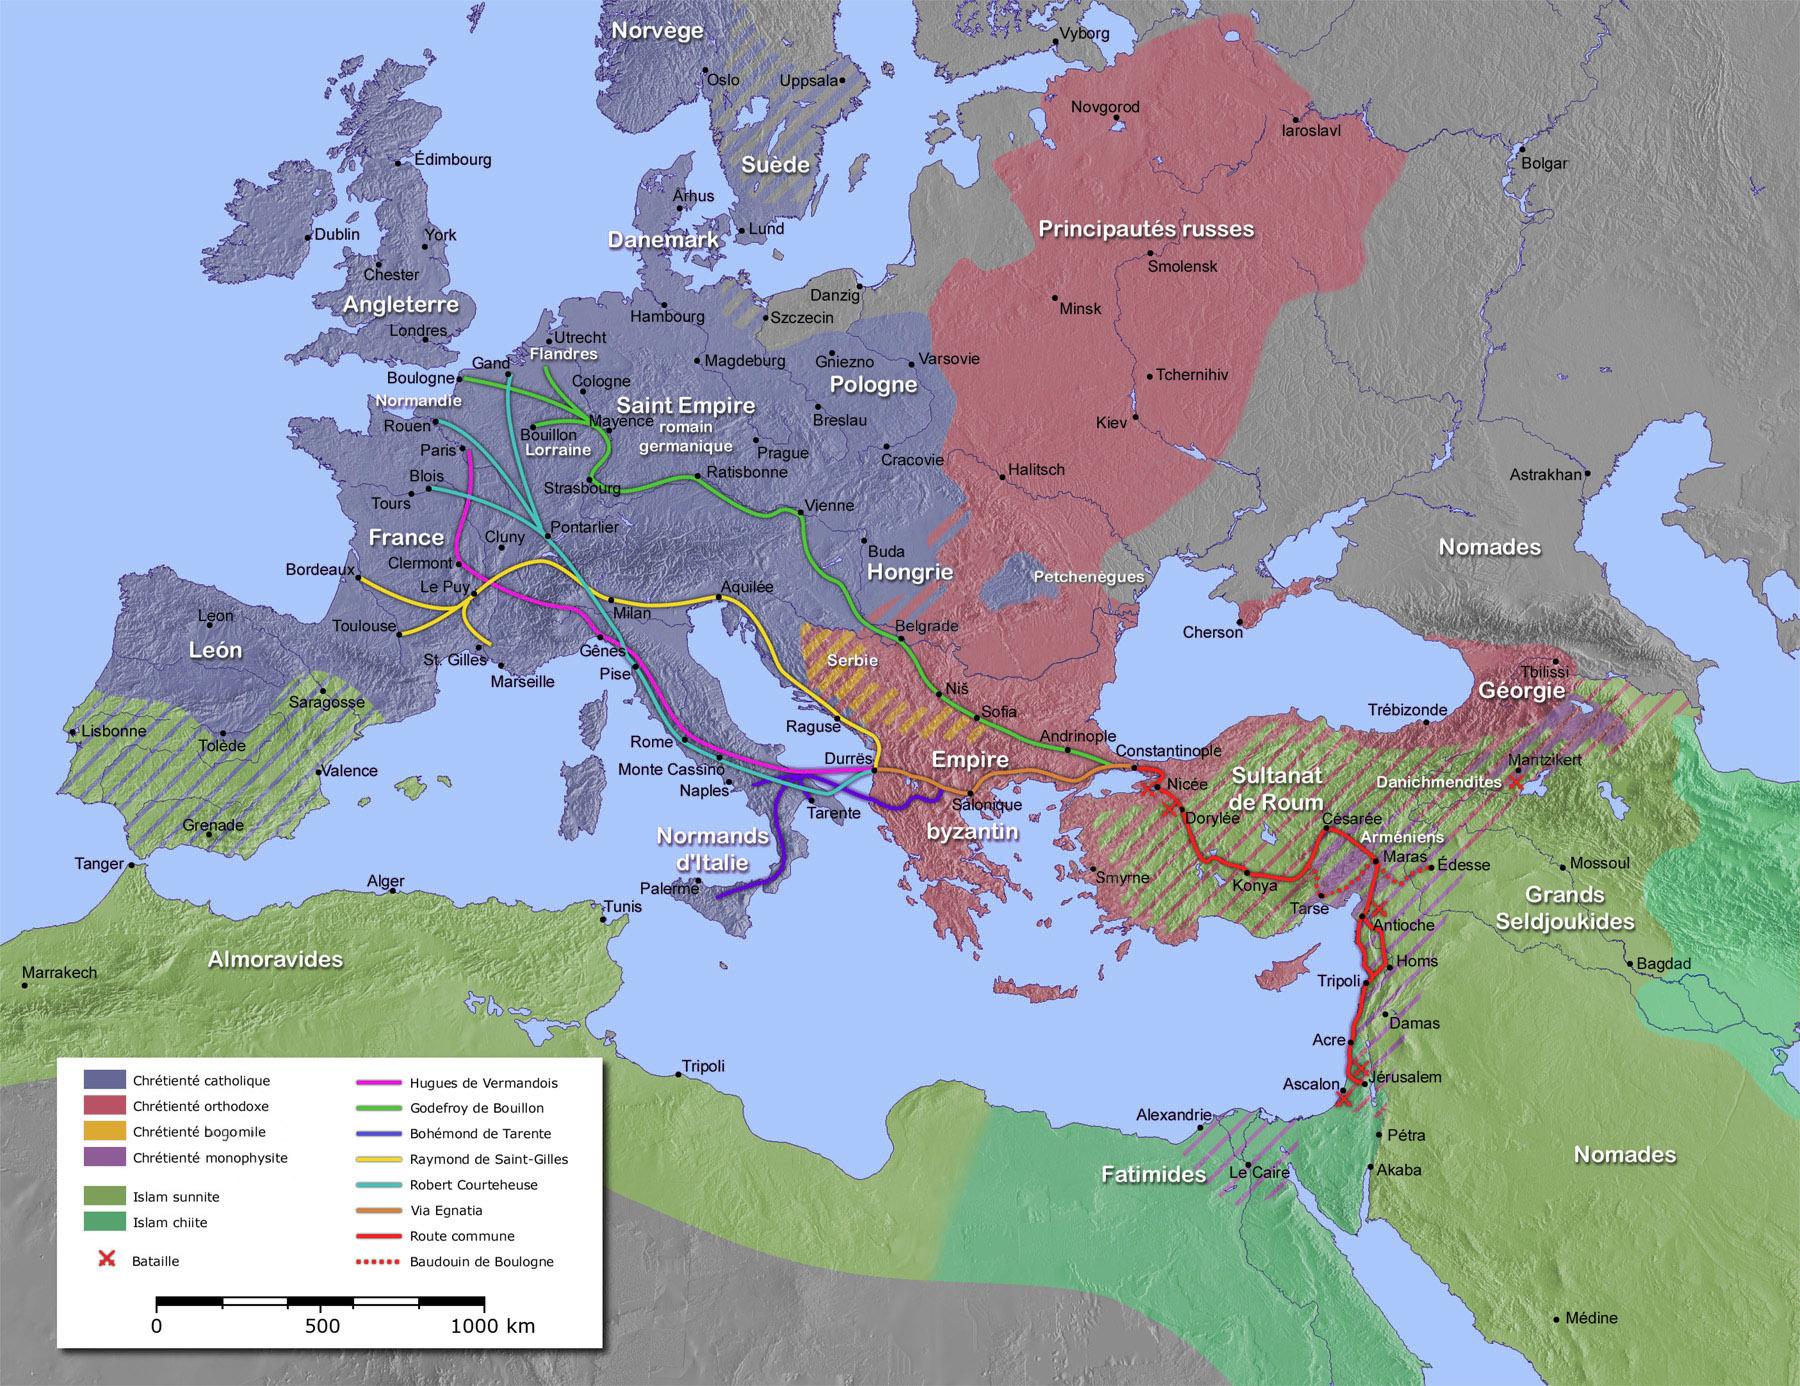 File:Carte de la premiere croisade.jpg - Wikimedia Commons